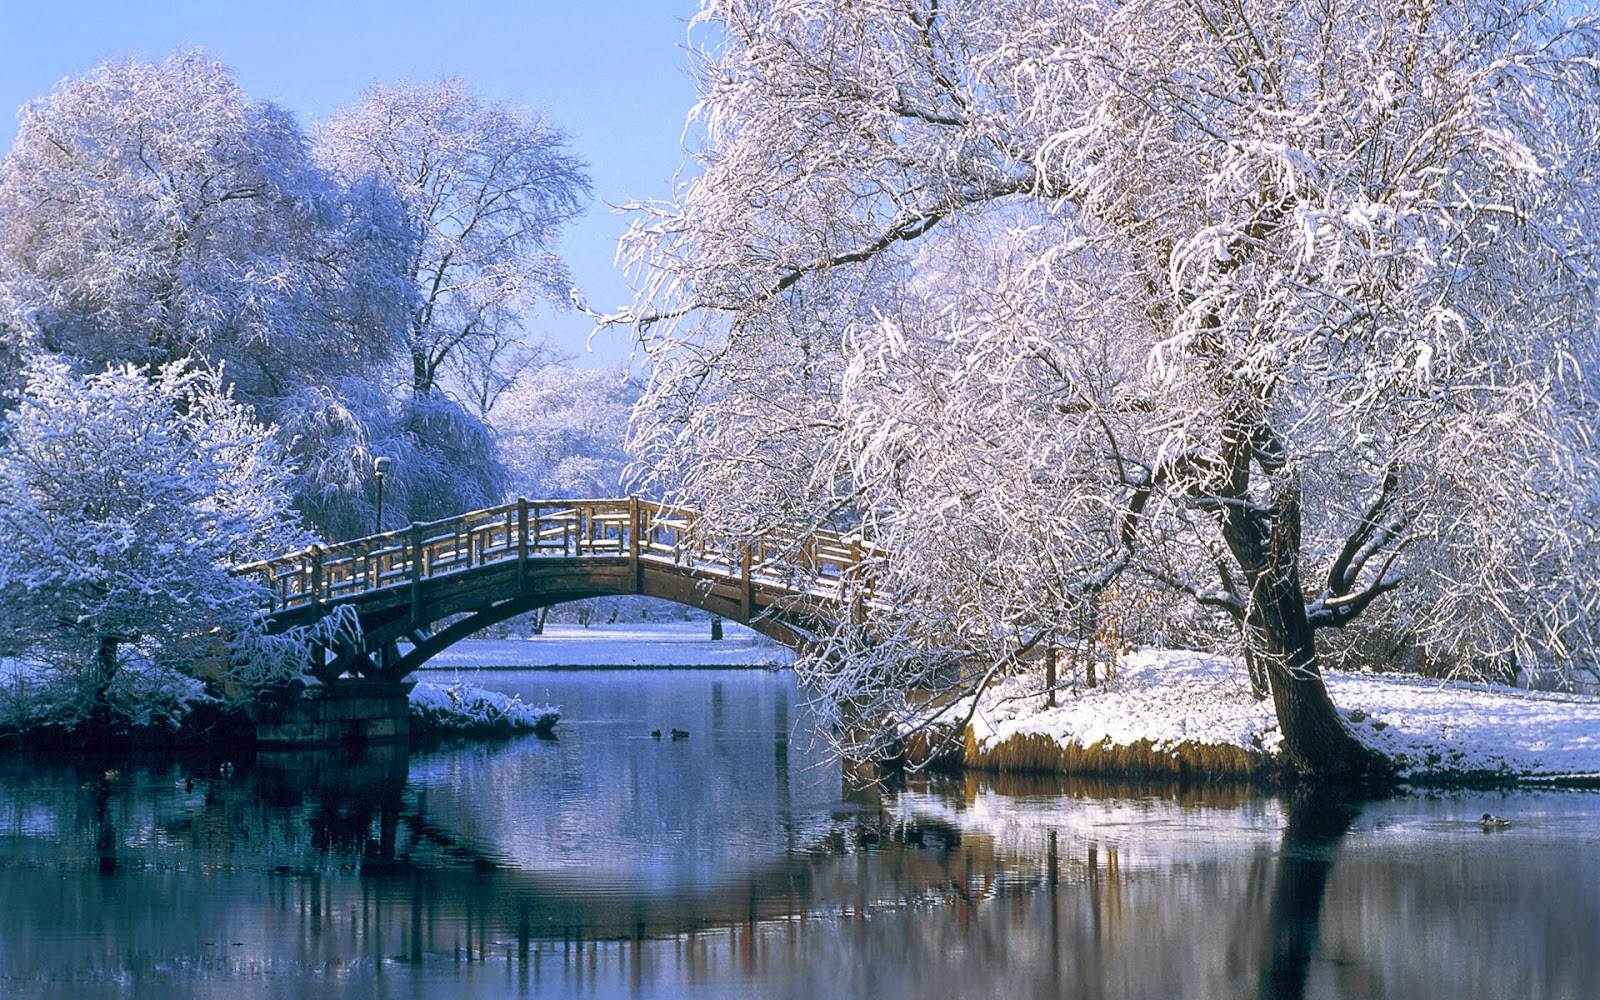 Beautiful scenery of winter season free hd wallpapers hd - Hd photos of scenery ...